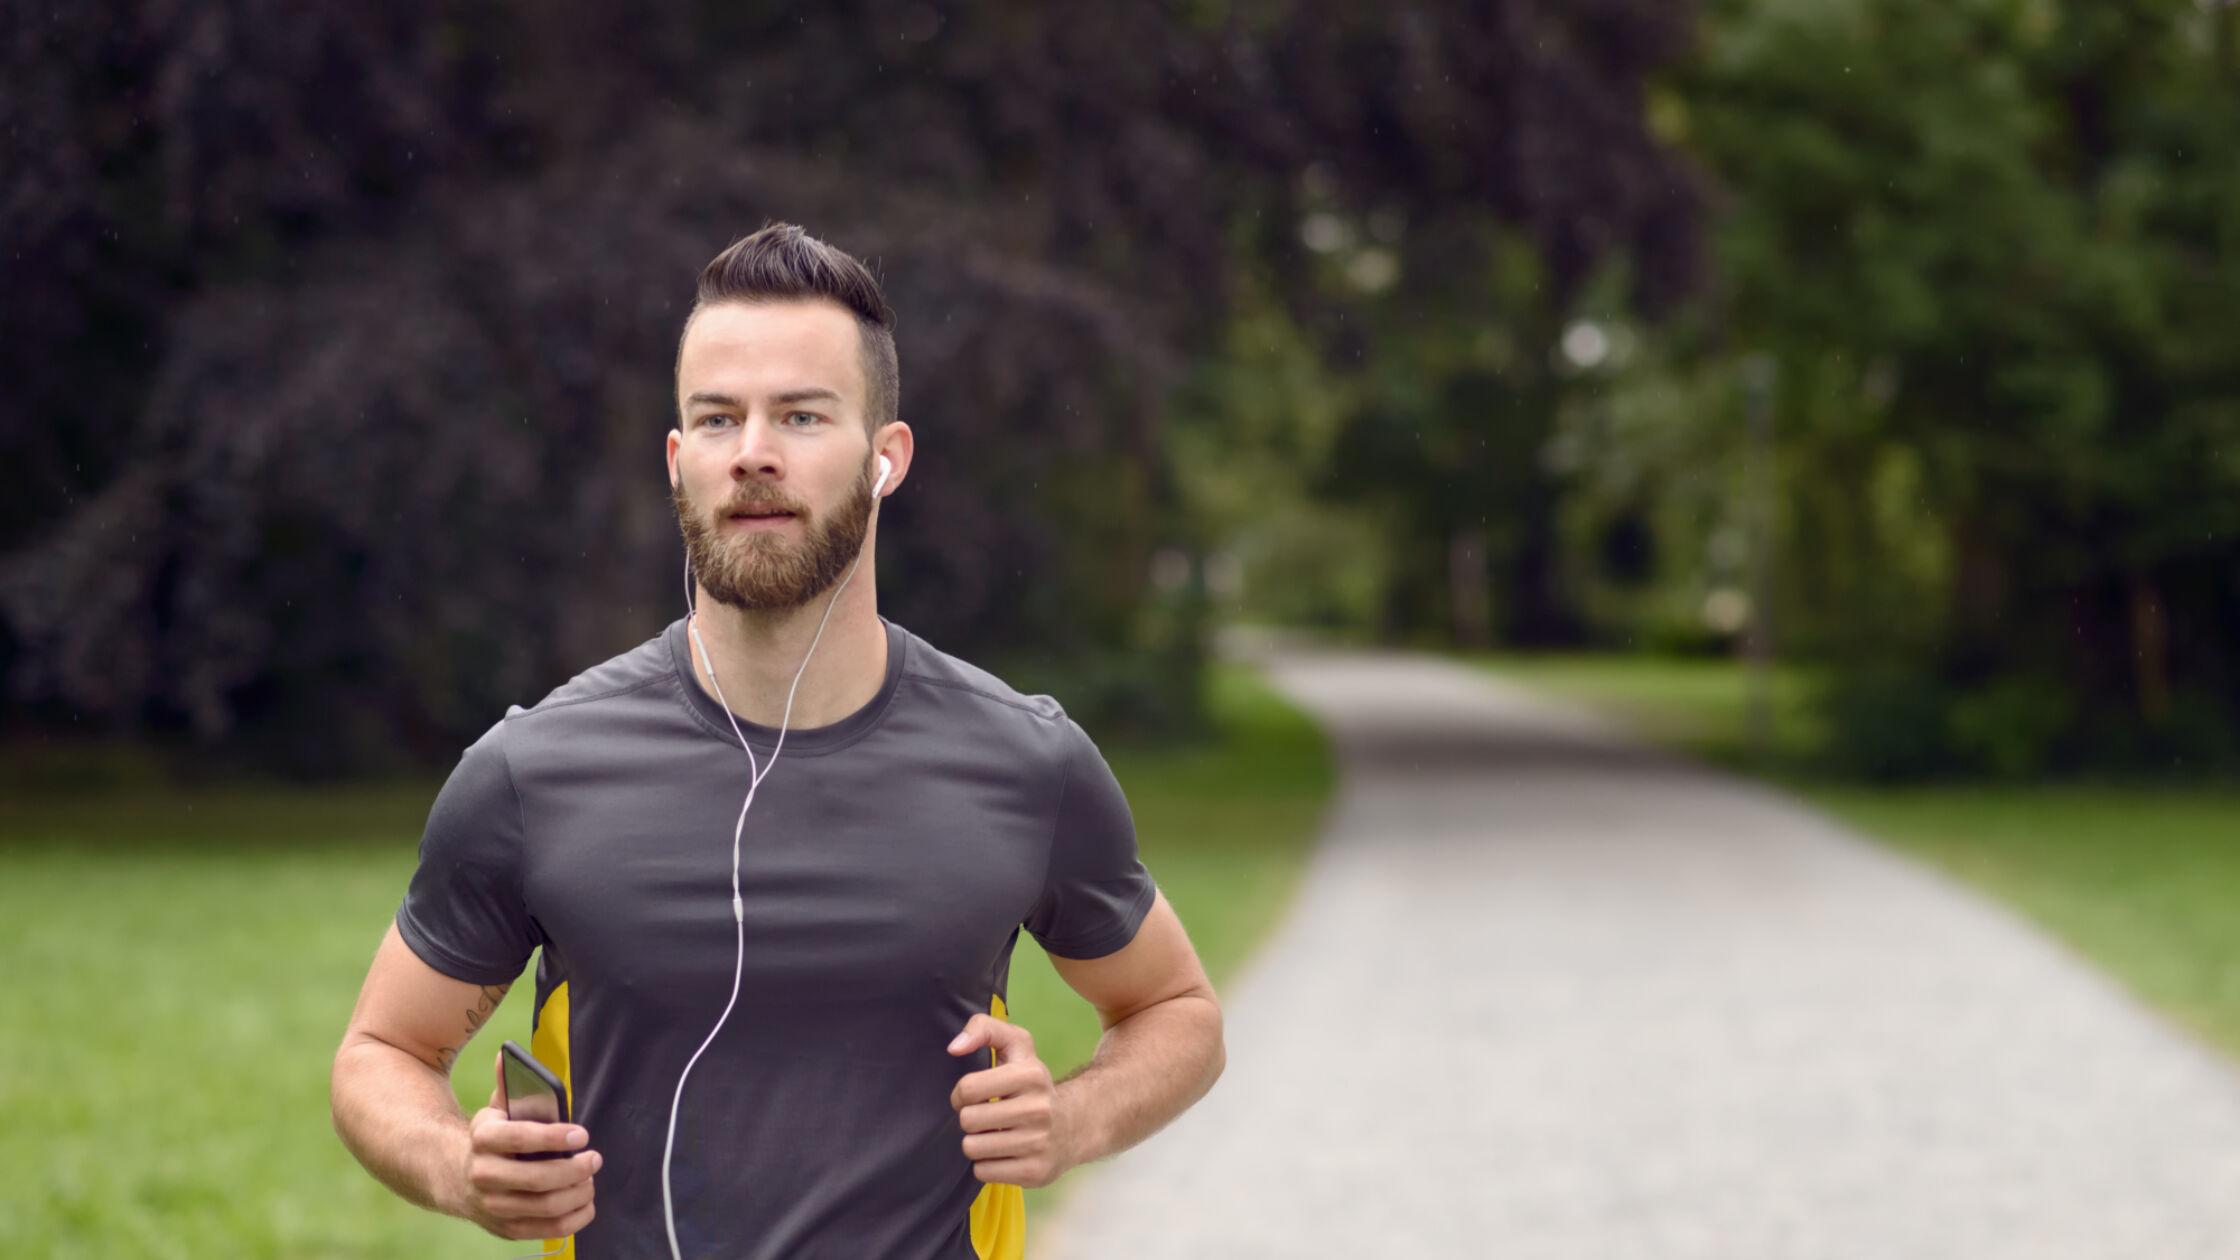 Mentale training: hardlopen met je hoofd